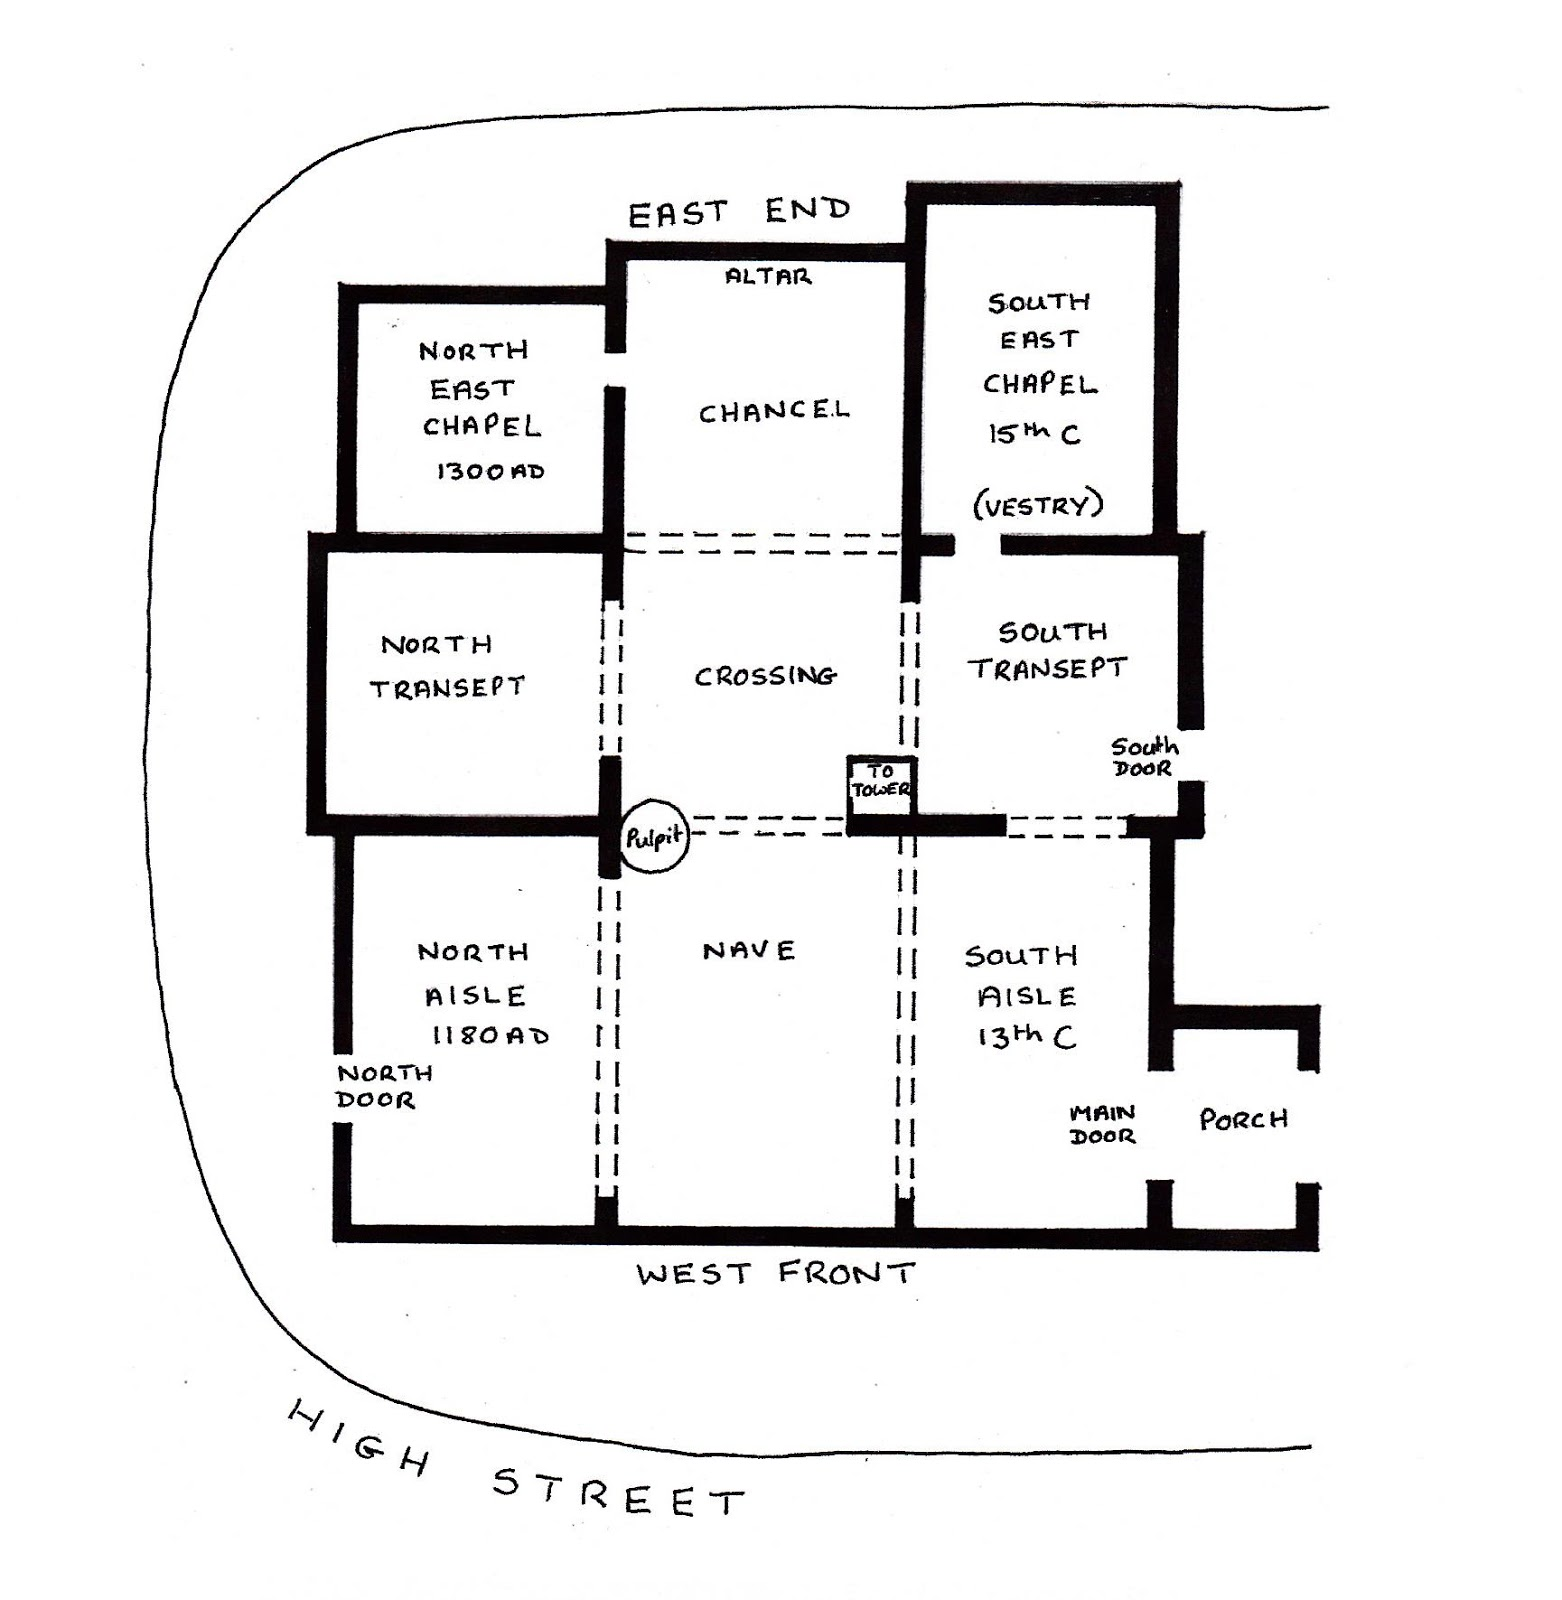 Diagram Parts Of A Church Blank Human Skull Arksey Village History Notes On The Parish